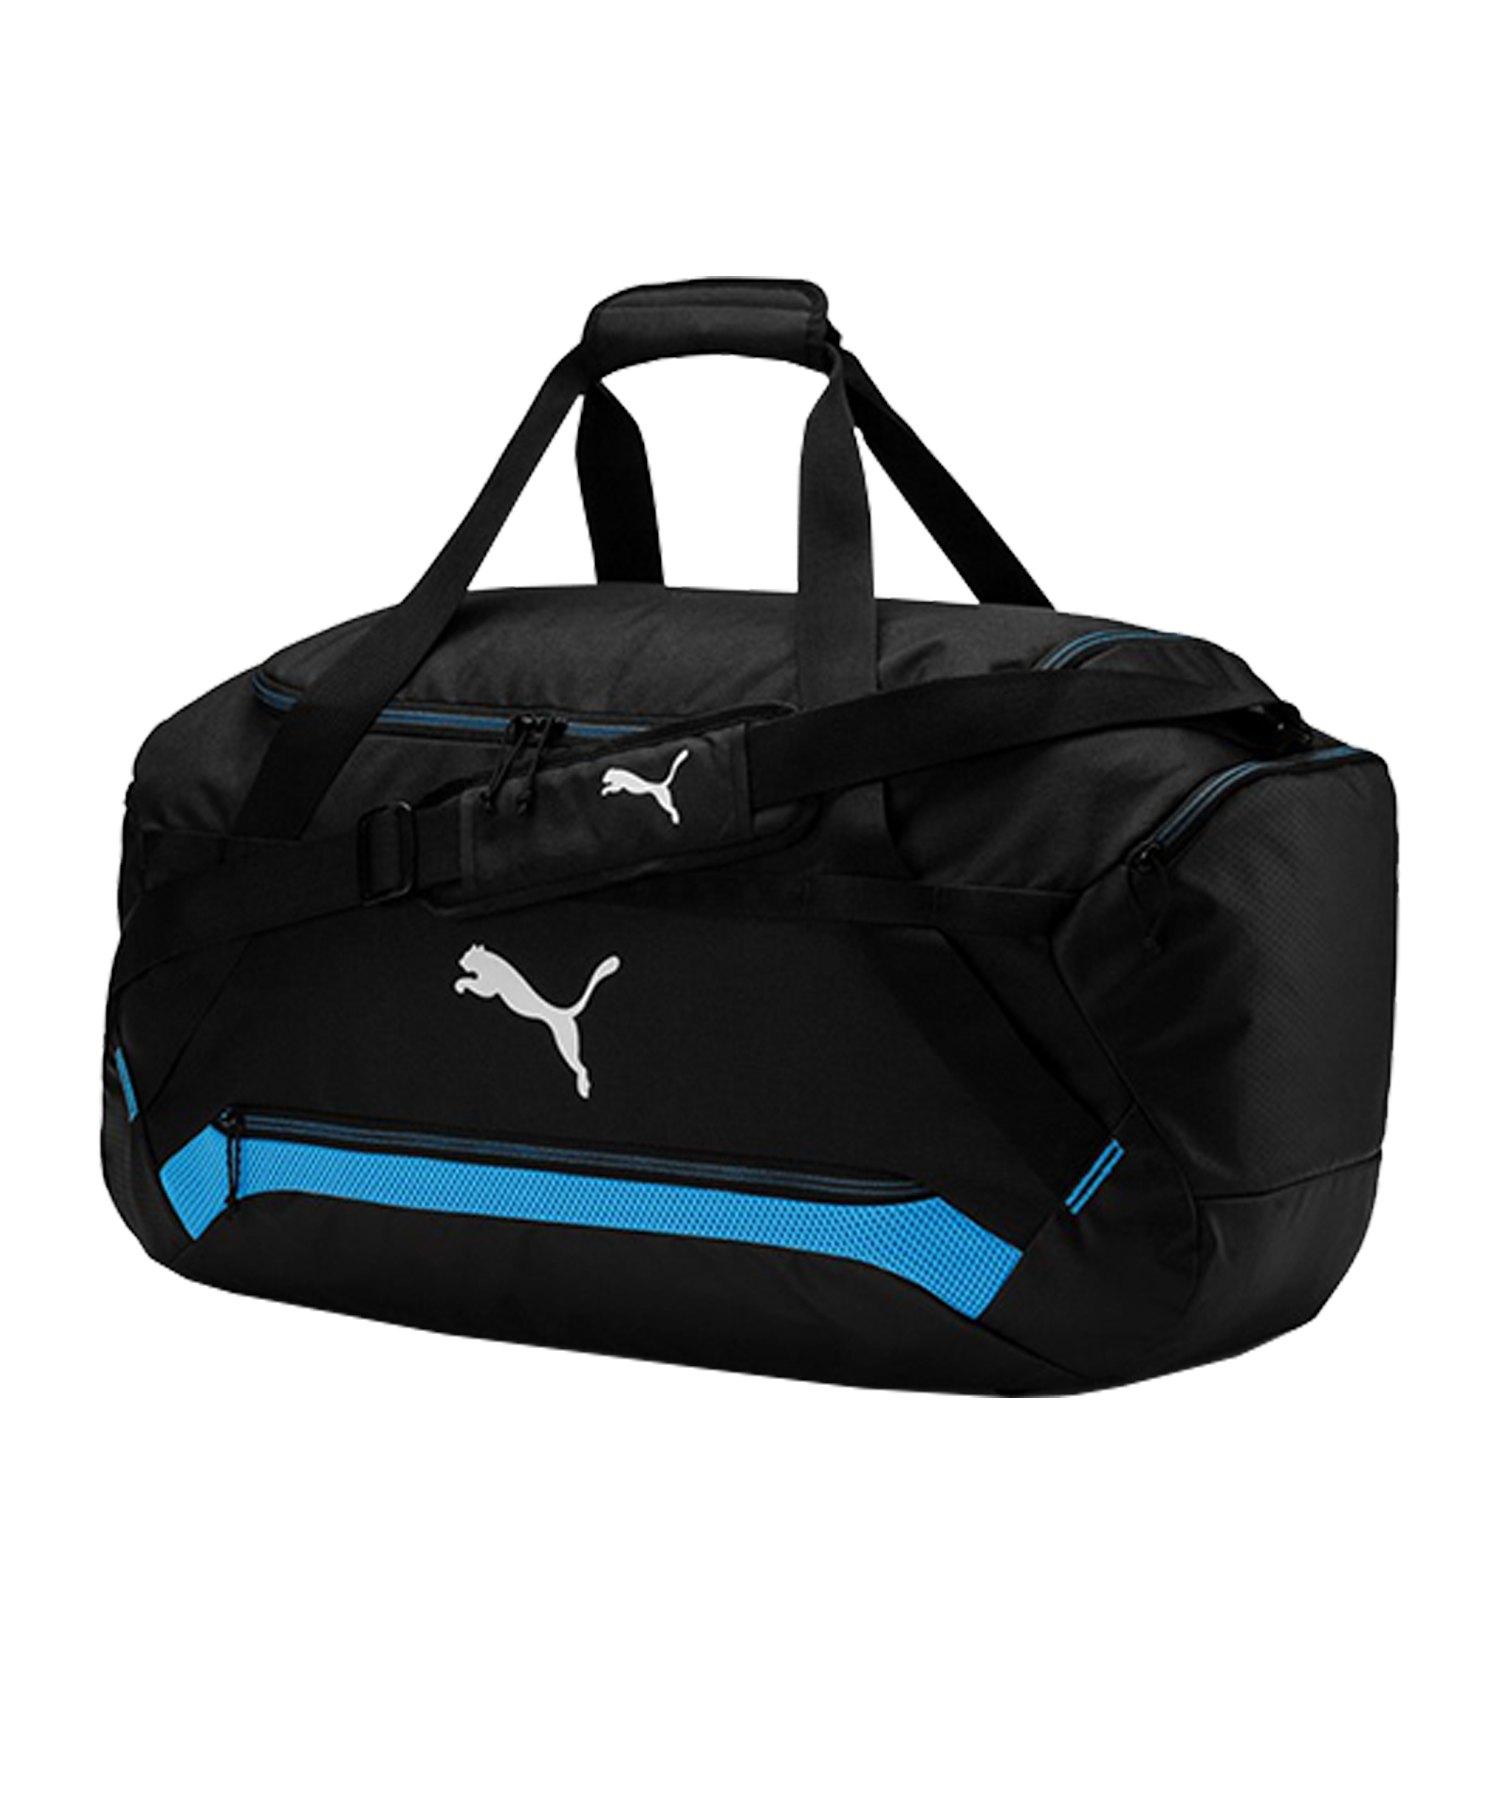 a2c353a571a74 PUMA Final Pro Medium Bag Sporttasche F01 - schwarz